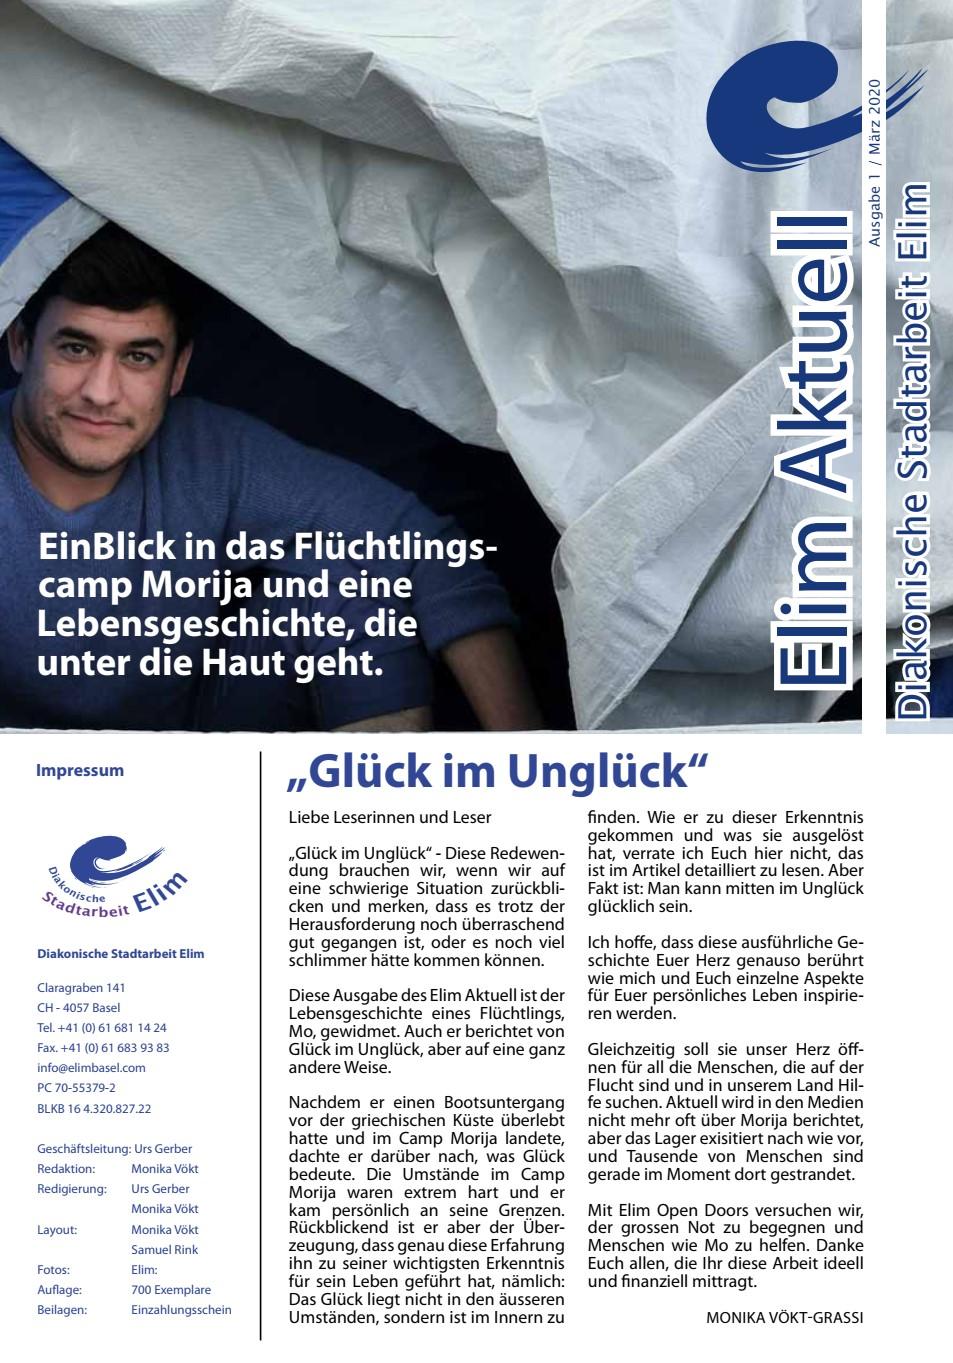 Titelblatt-EA-2020_3.jpg - 346.08 kB